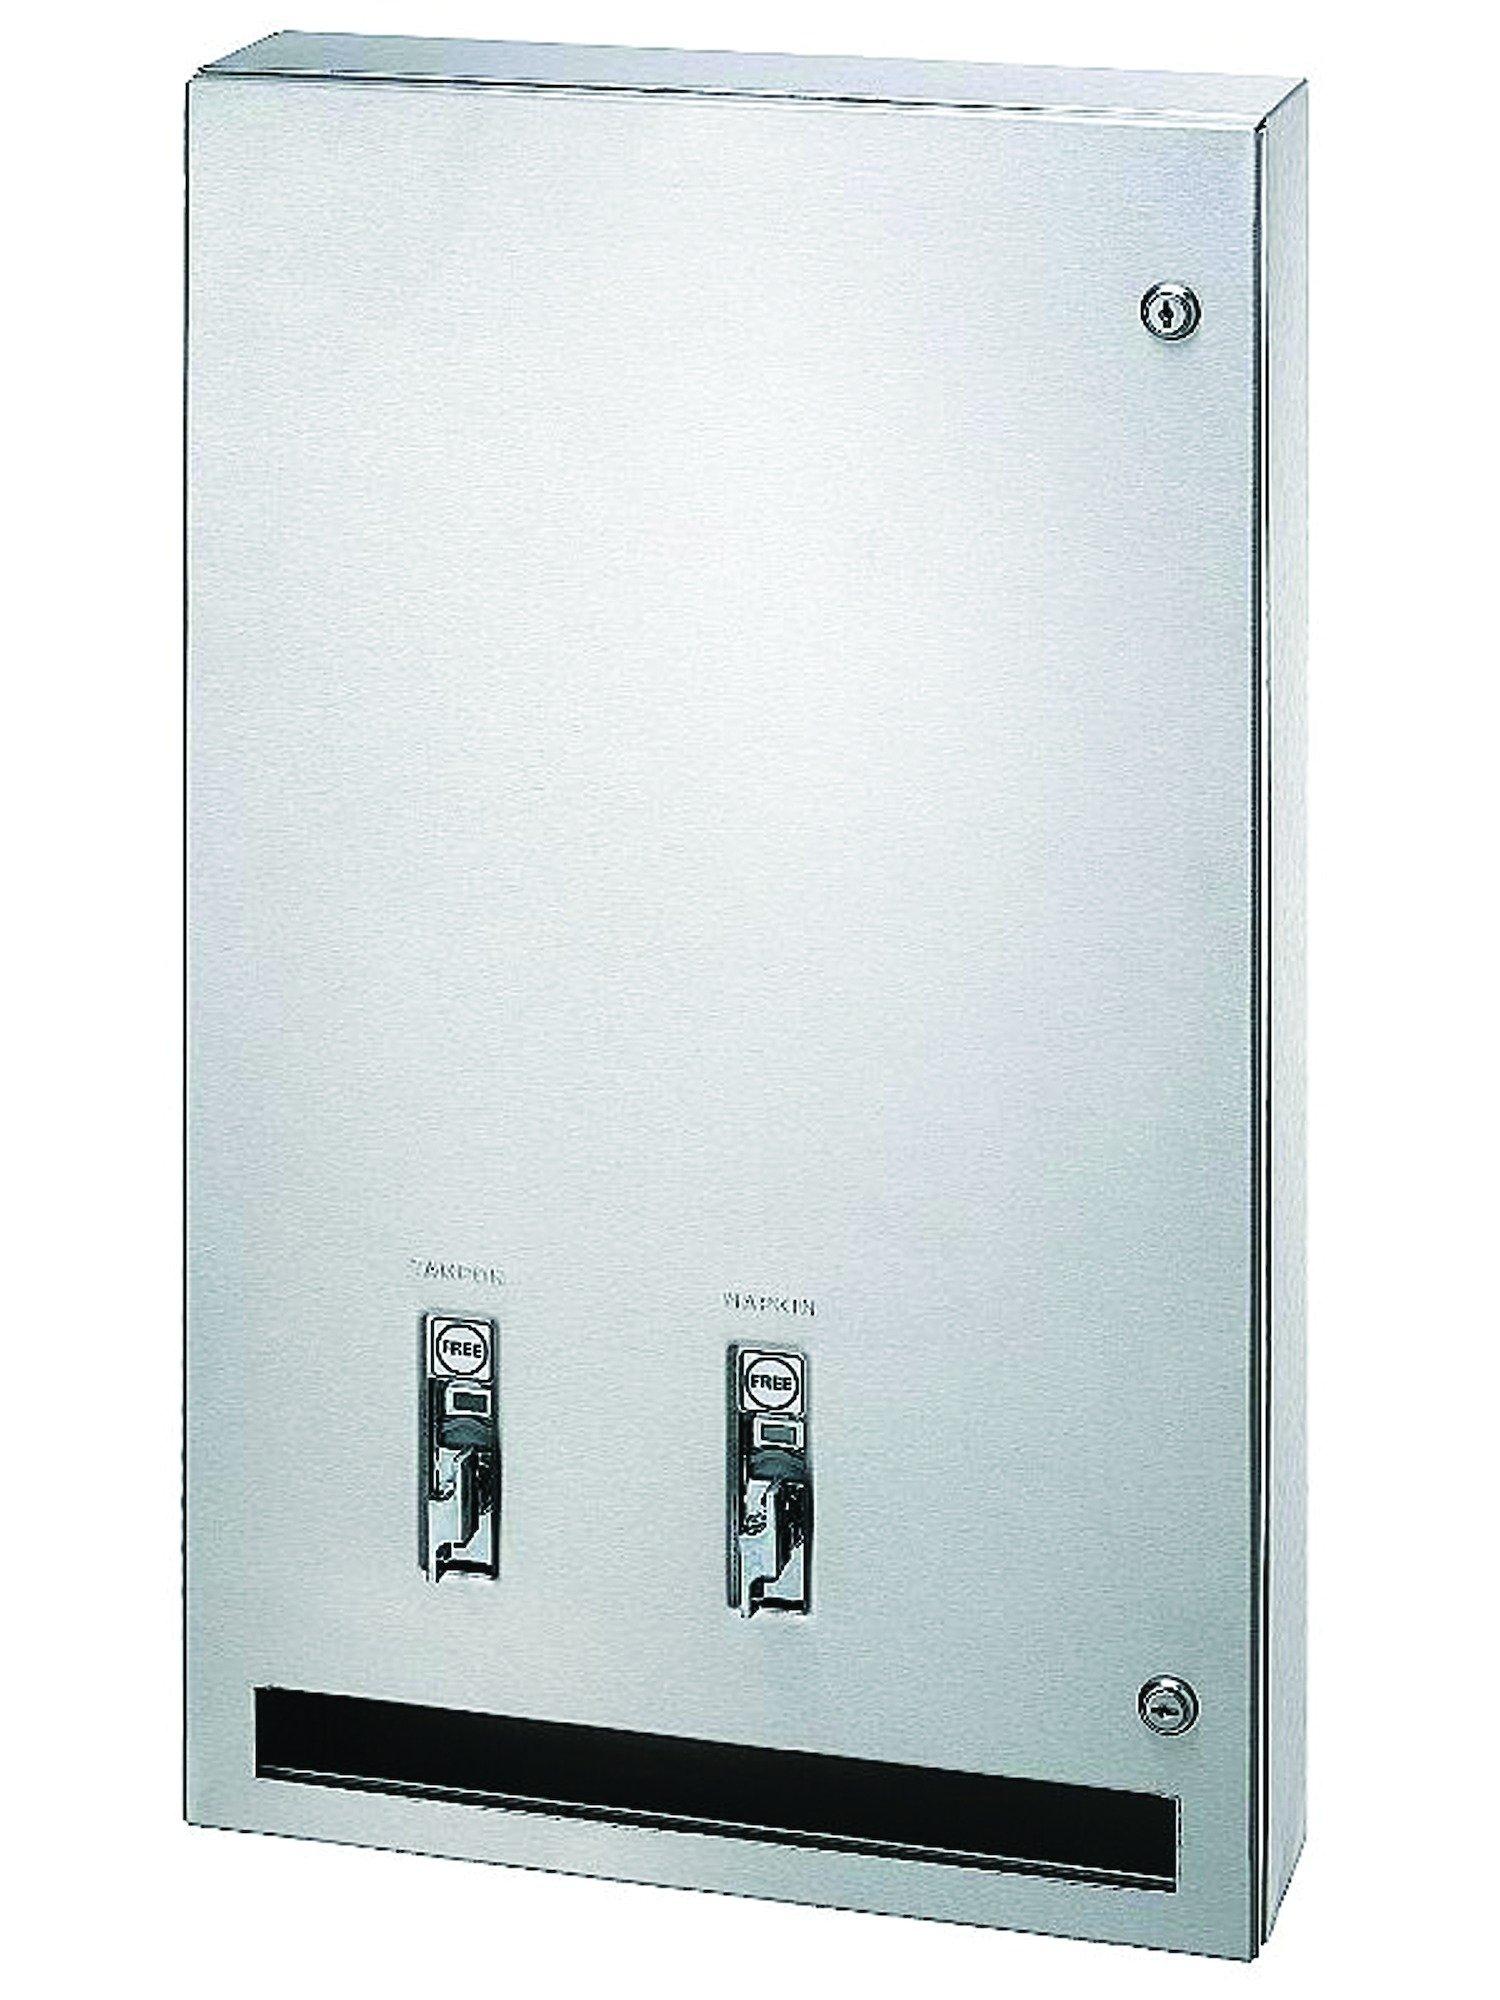 Bradley Napkin Tampon Vendor 407 | Accurate Door & Hardware, Inc.